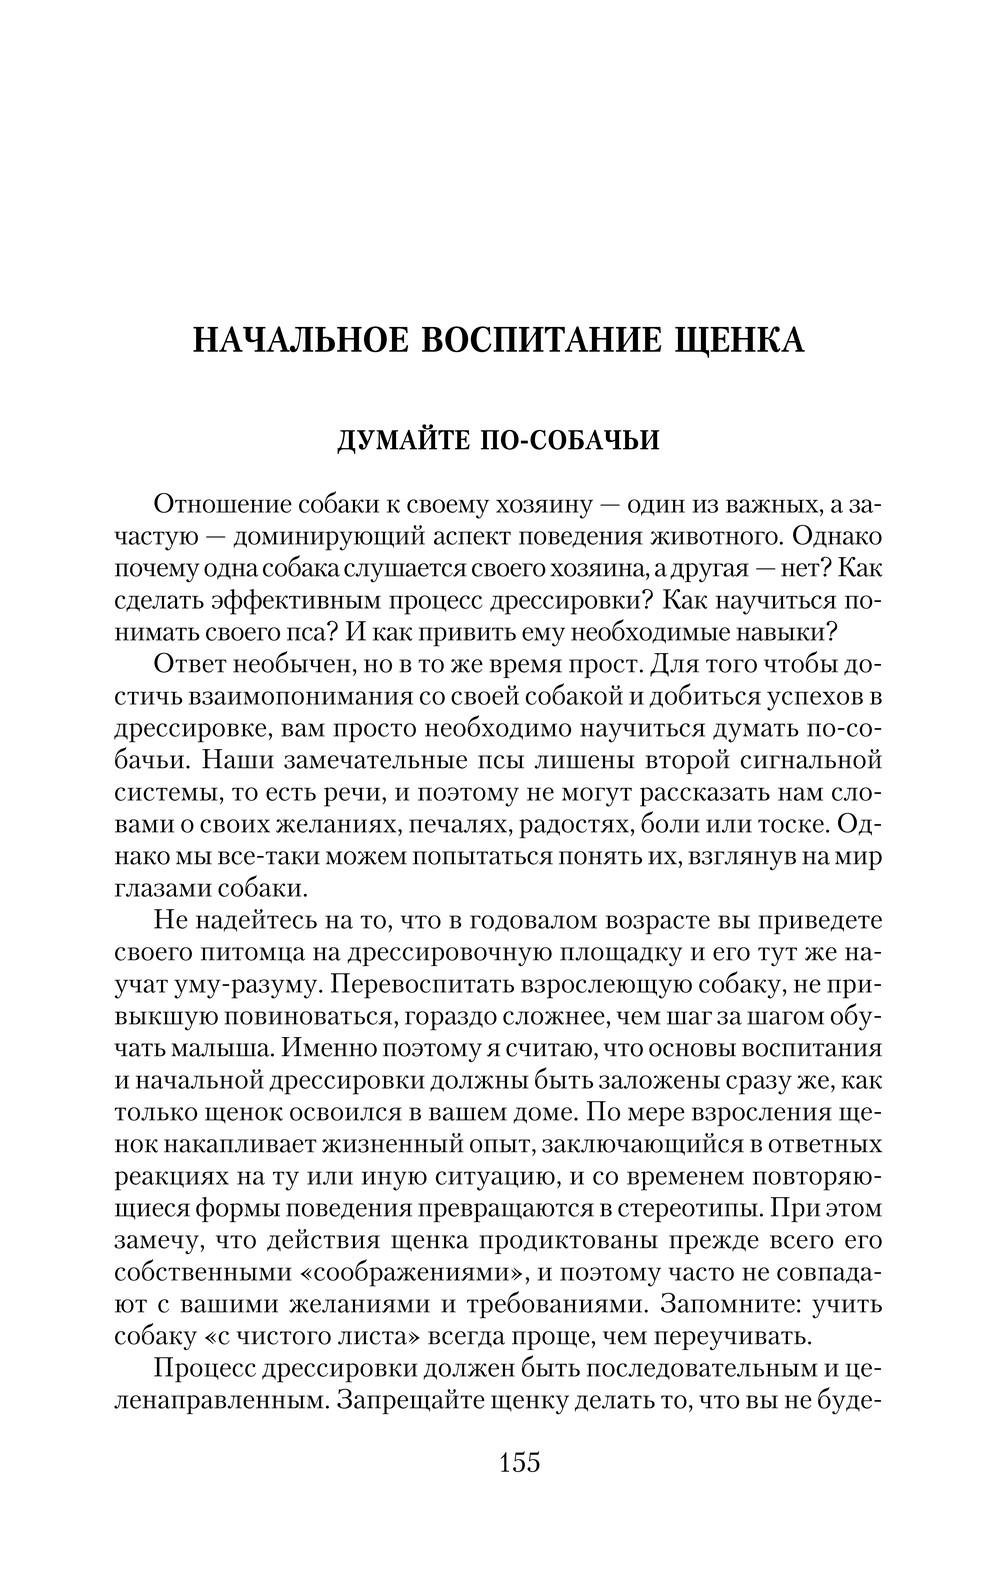 http://i6.imageban.ru/out/2014/01/12/b058e207185dba9809f79c43f40b3b3f.jpg